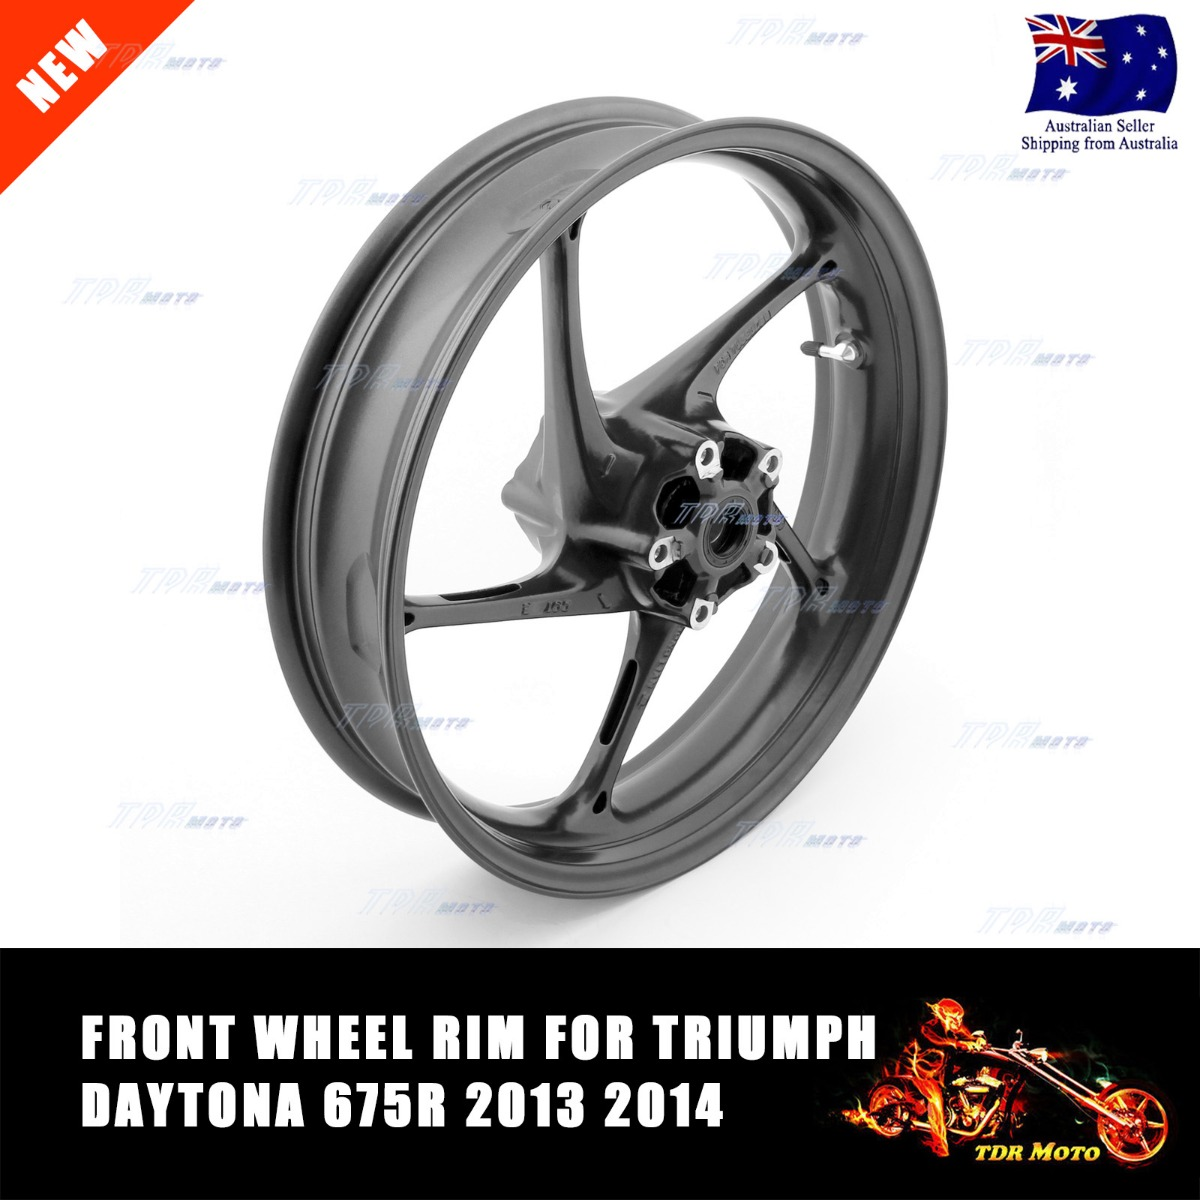 daytona 675r for sale uk